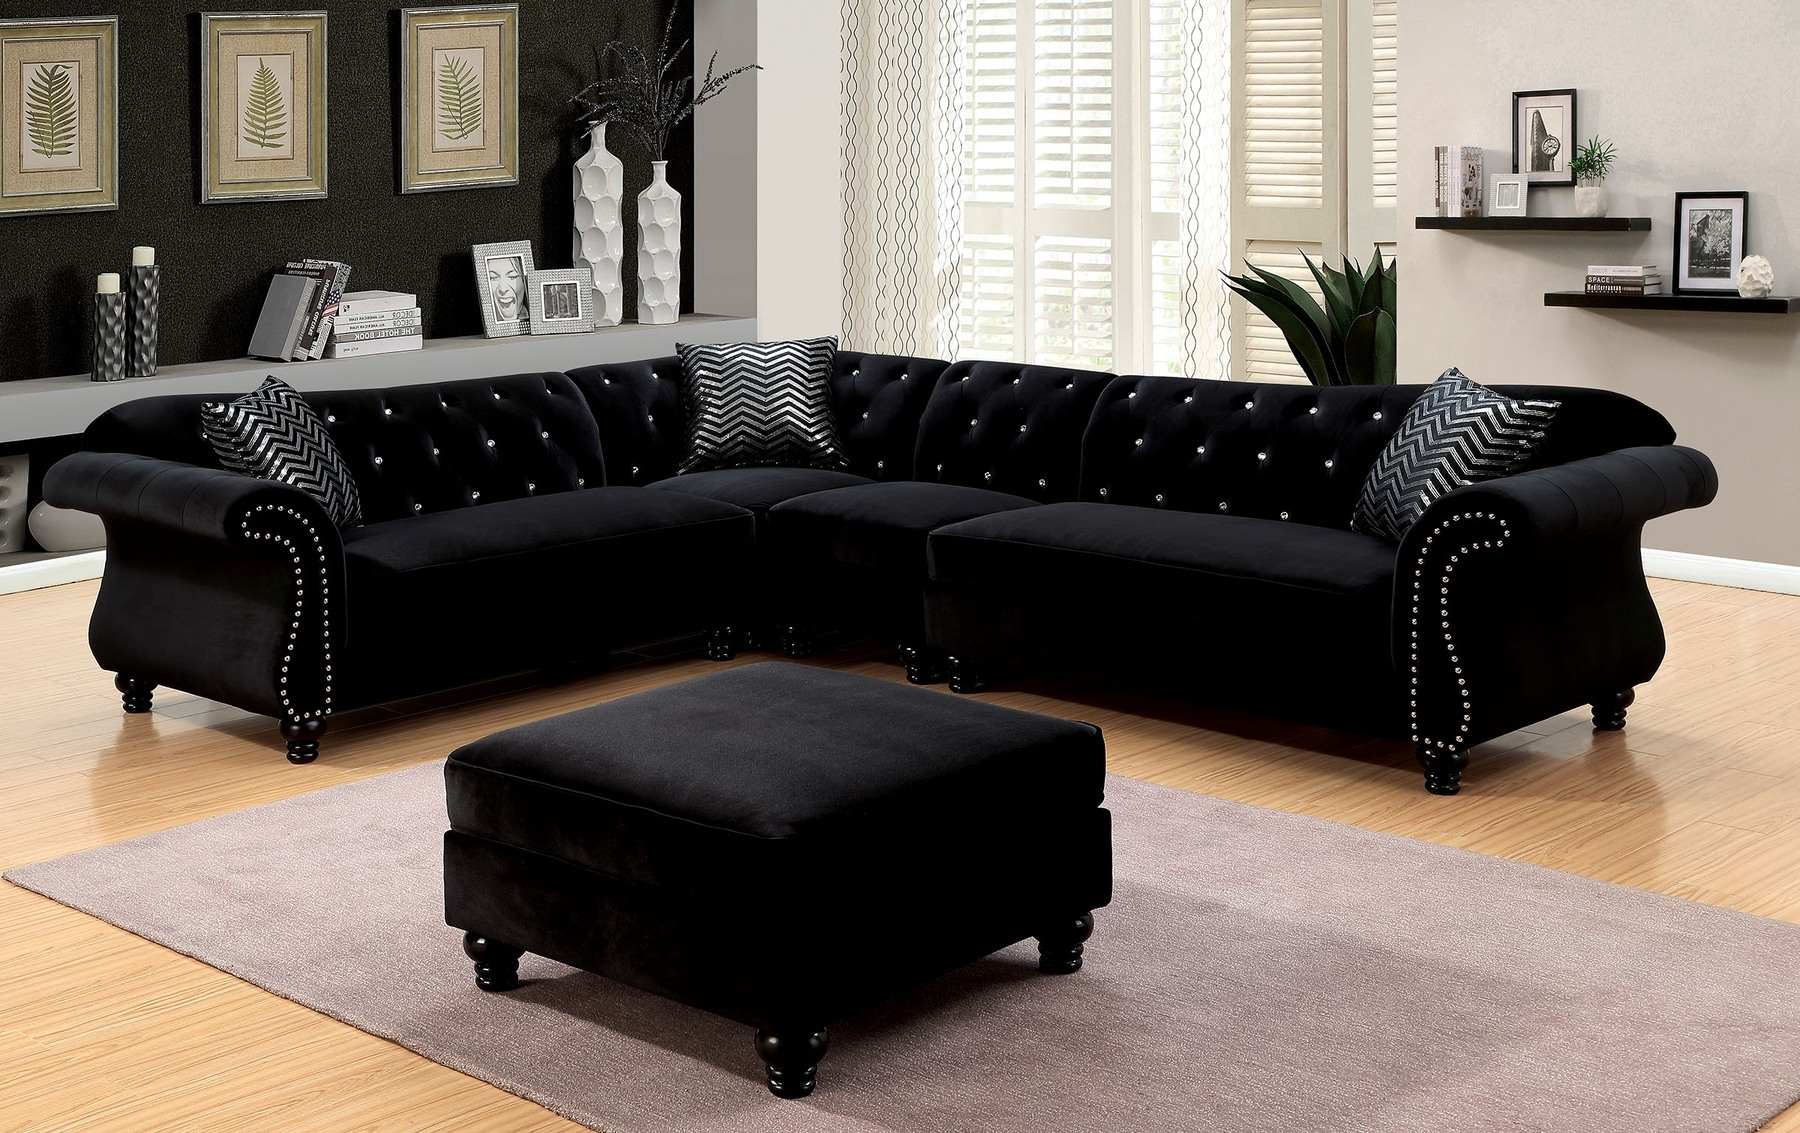 Preferred Jolanda Black Sectional Sofa Cm6158Bk Furniture Of America In Black Sectional Sofas (View 16 of 20)